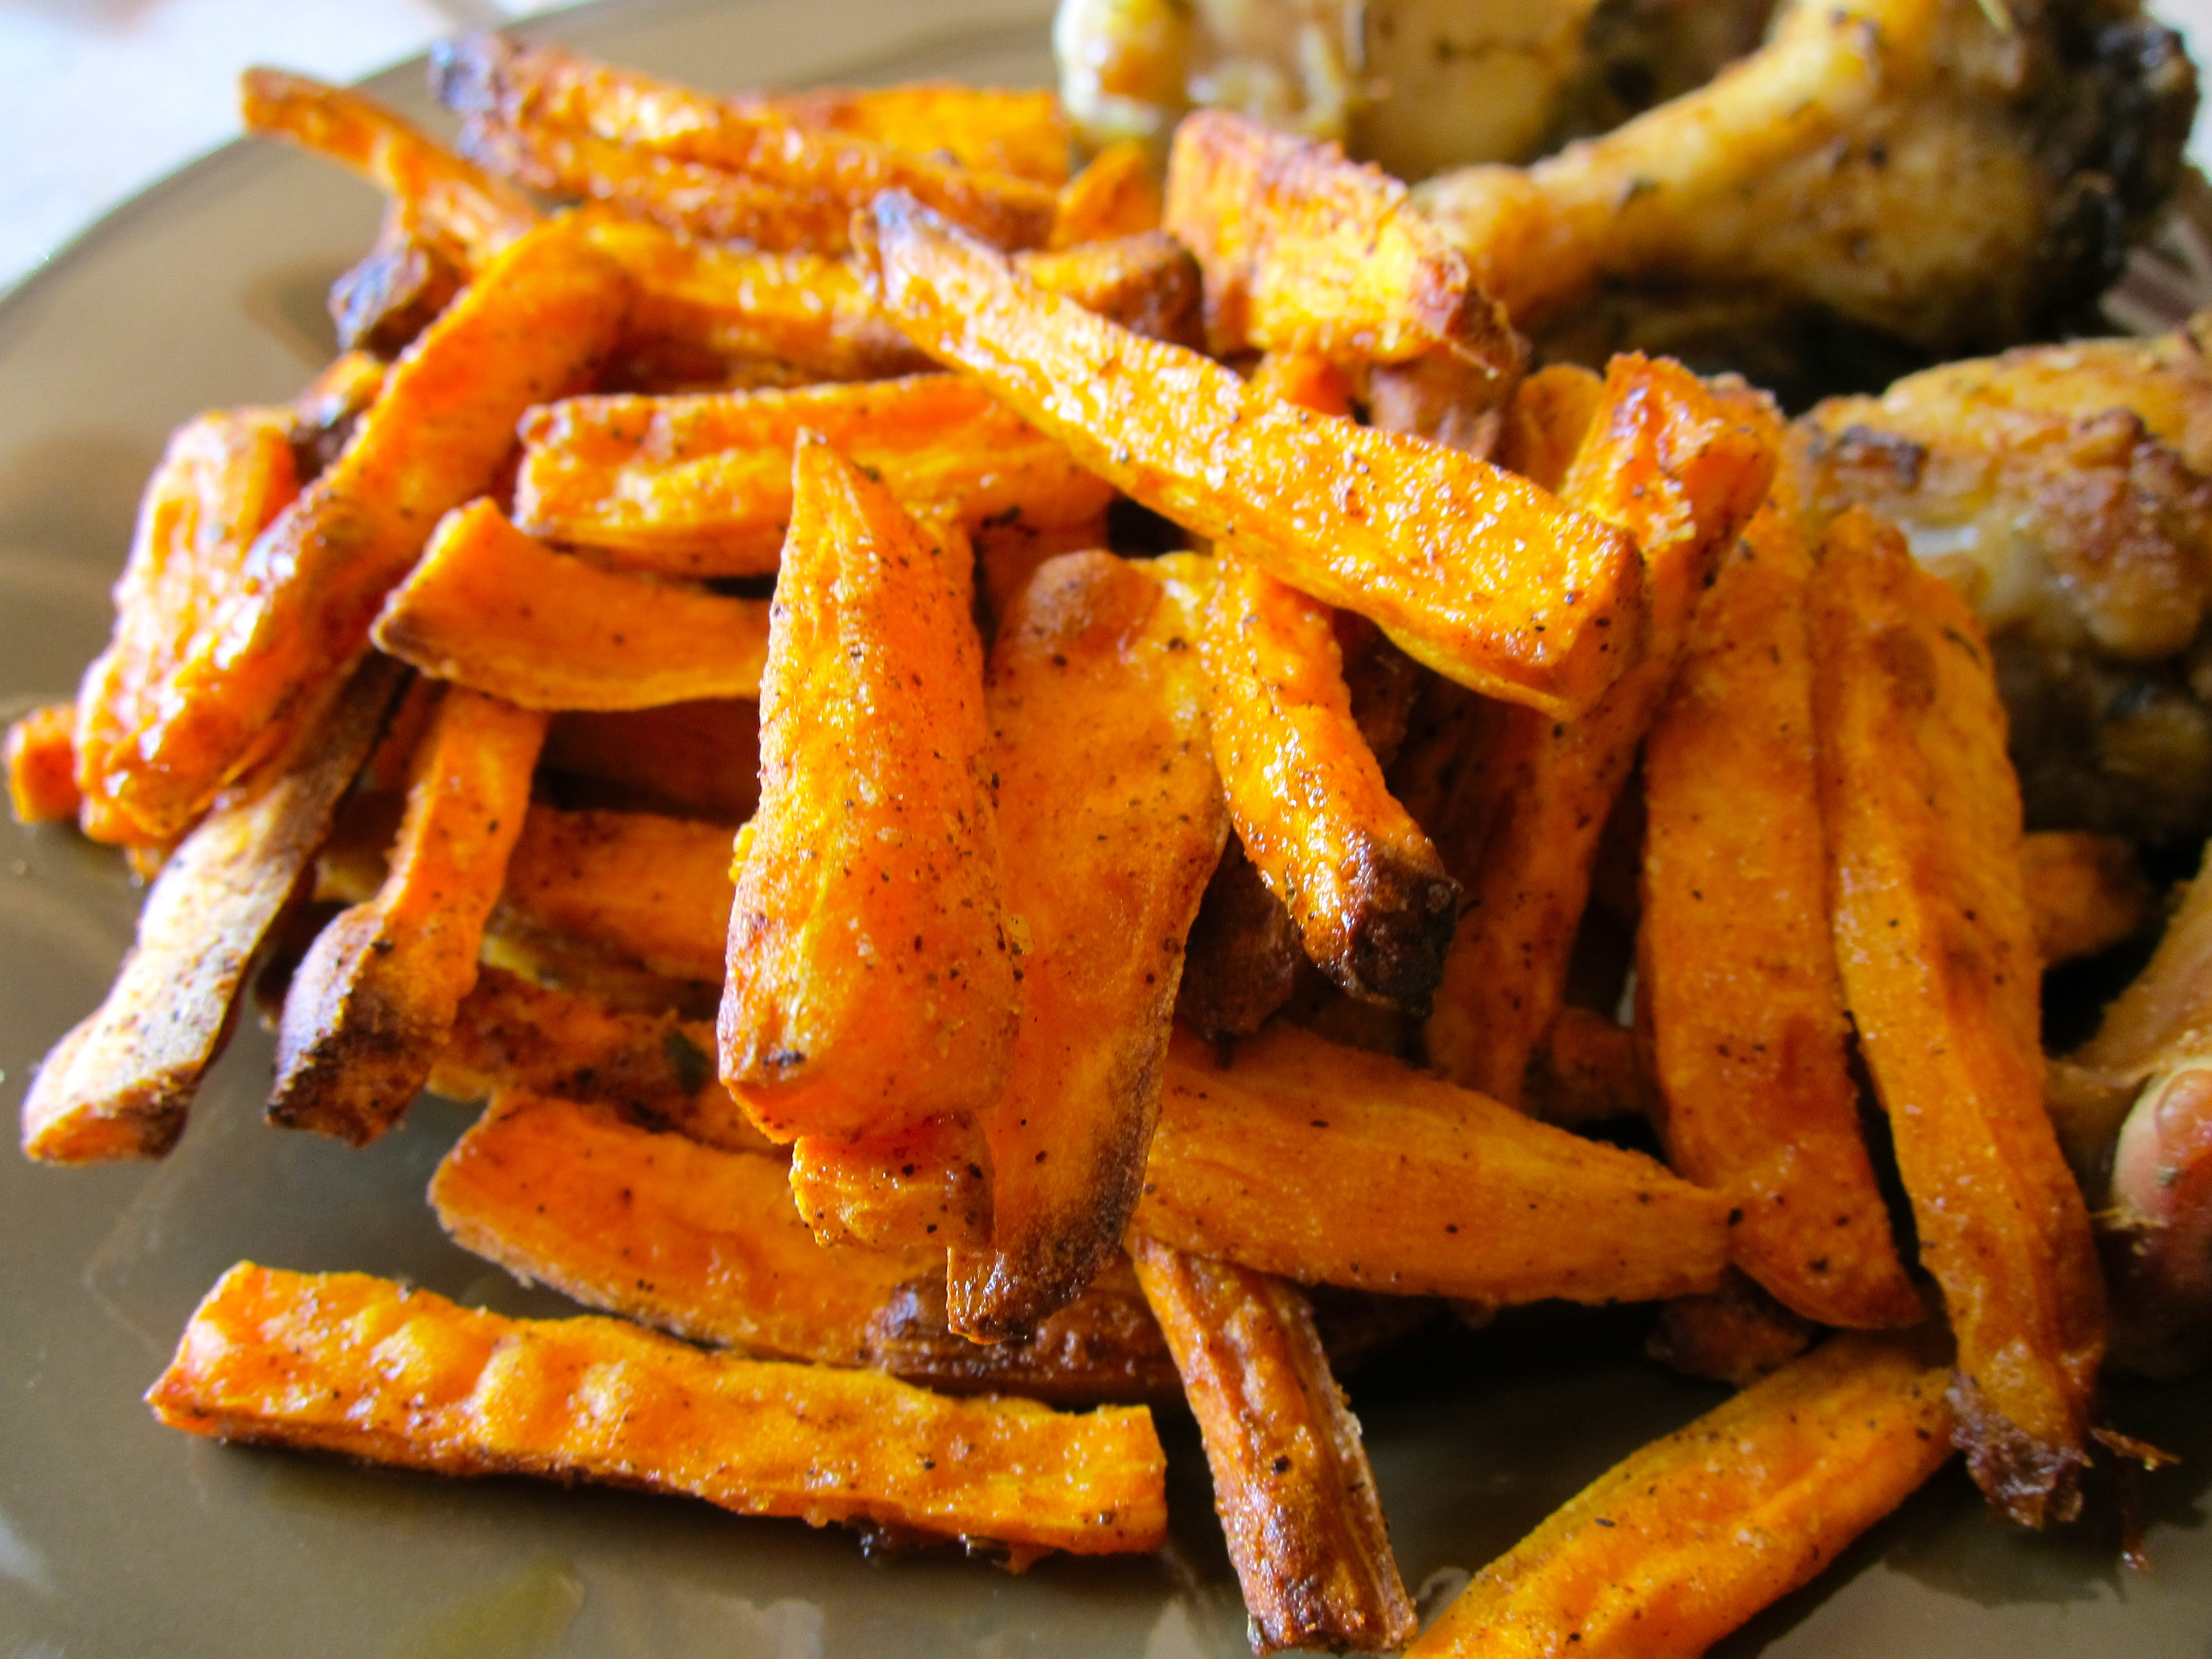 Crispy Baked Sweet Potato Fries  Crispy Sweet Potato Fries – Simply Living Healthy